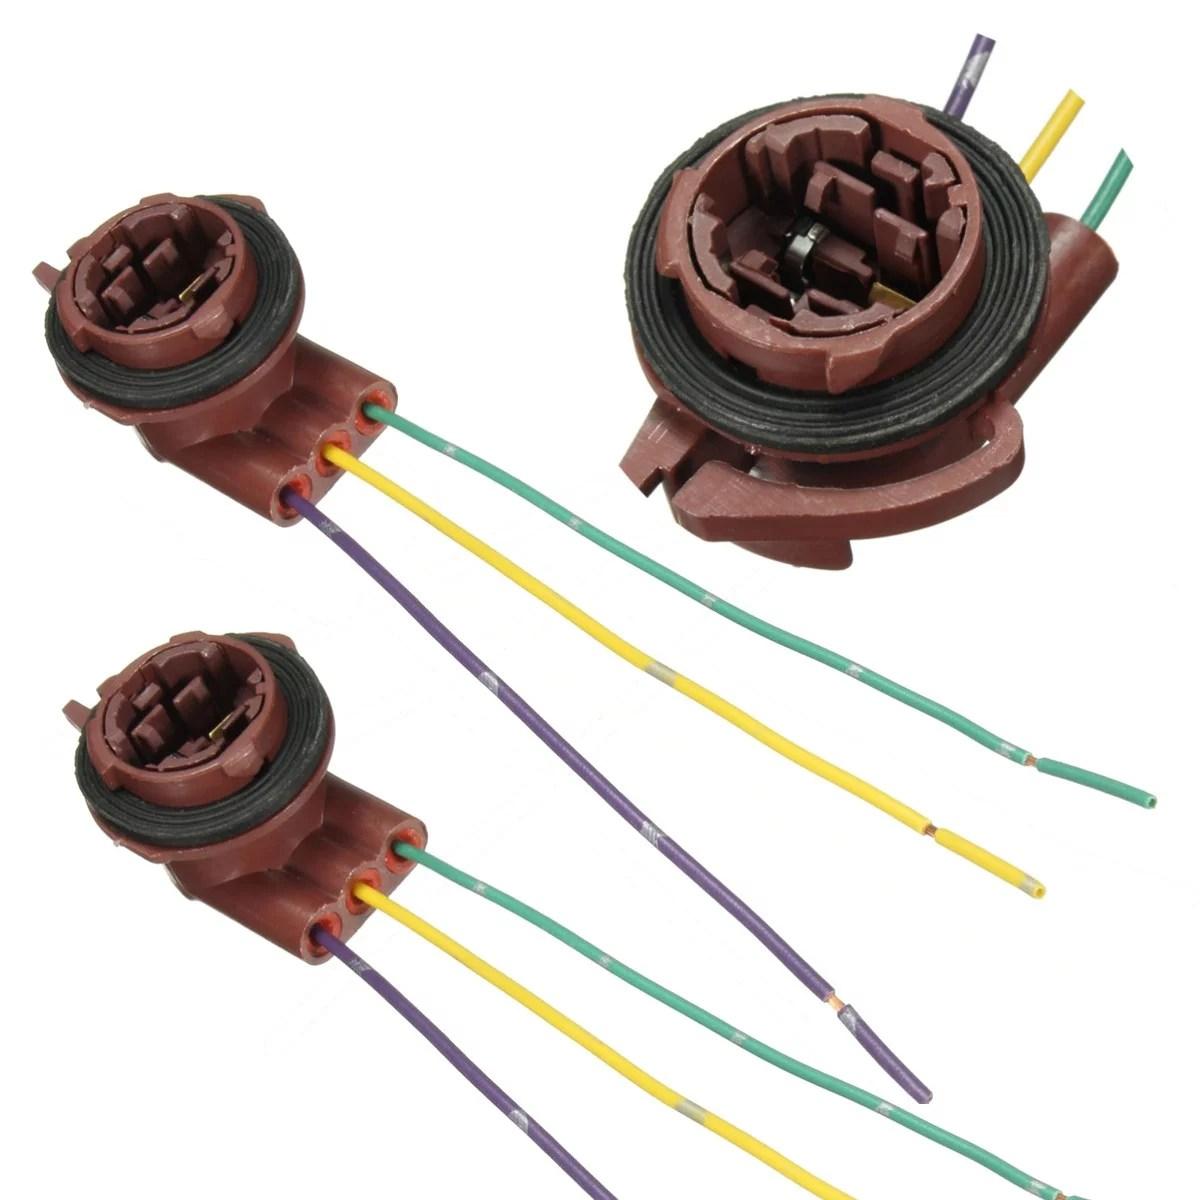 hight resolution of matcc 2pcs 12v brake turn signal indicator light socket wiring ford 4000 tractor wiring diagram 12v plug wiring harness adapter